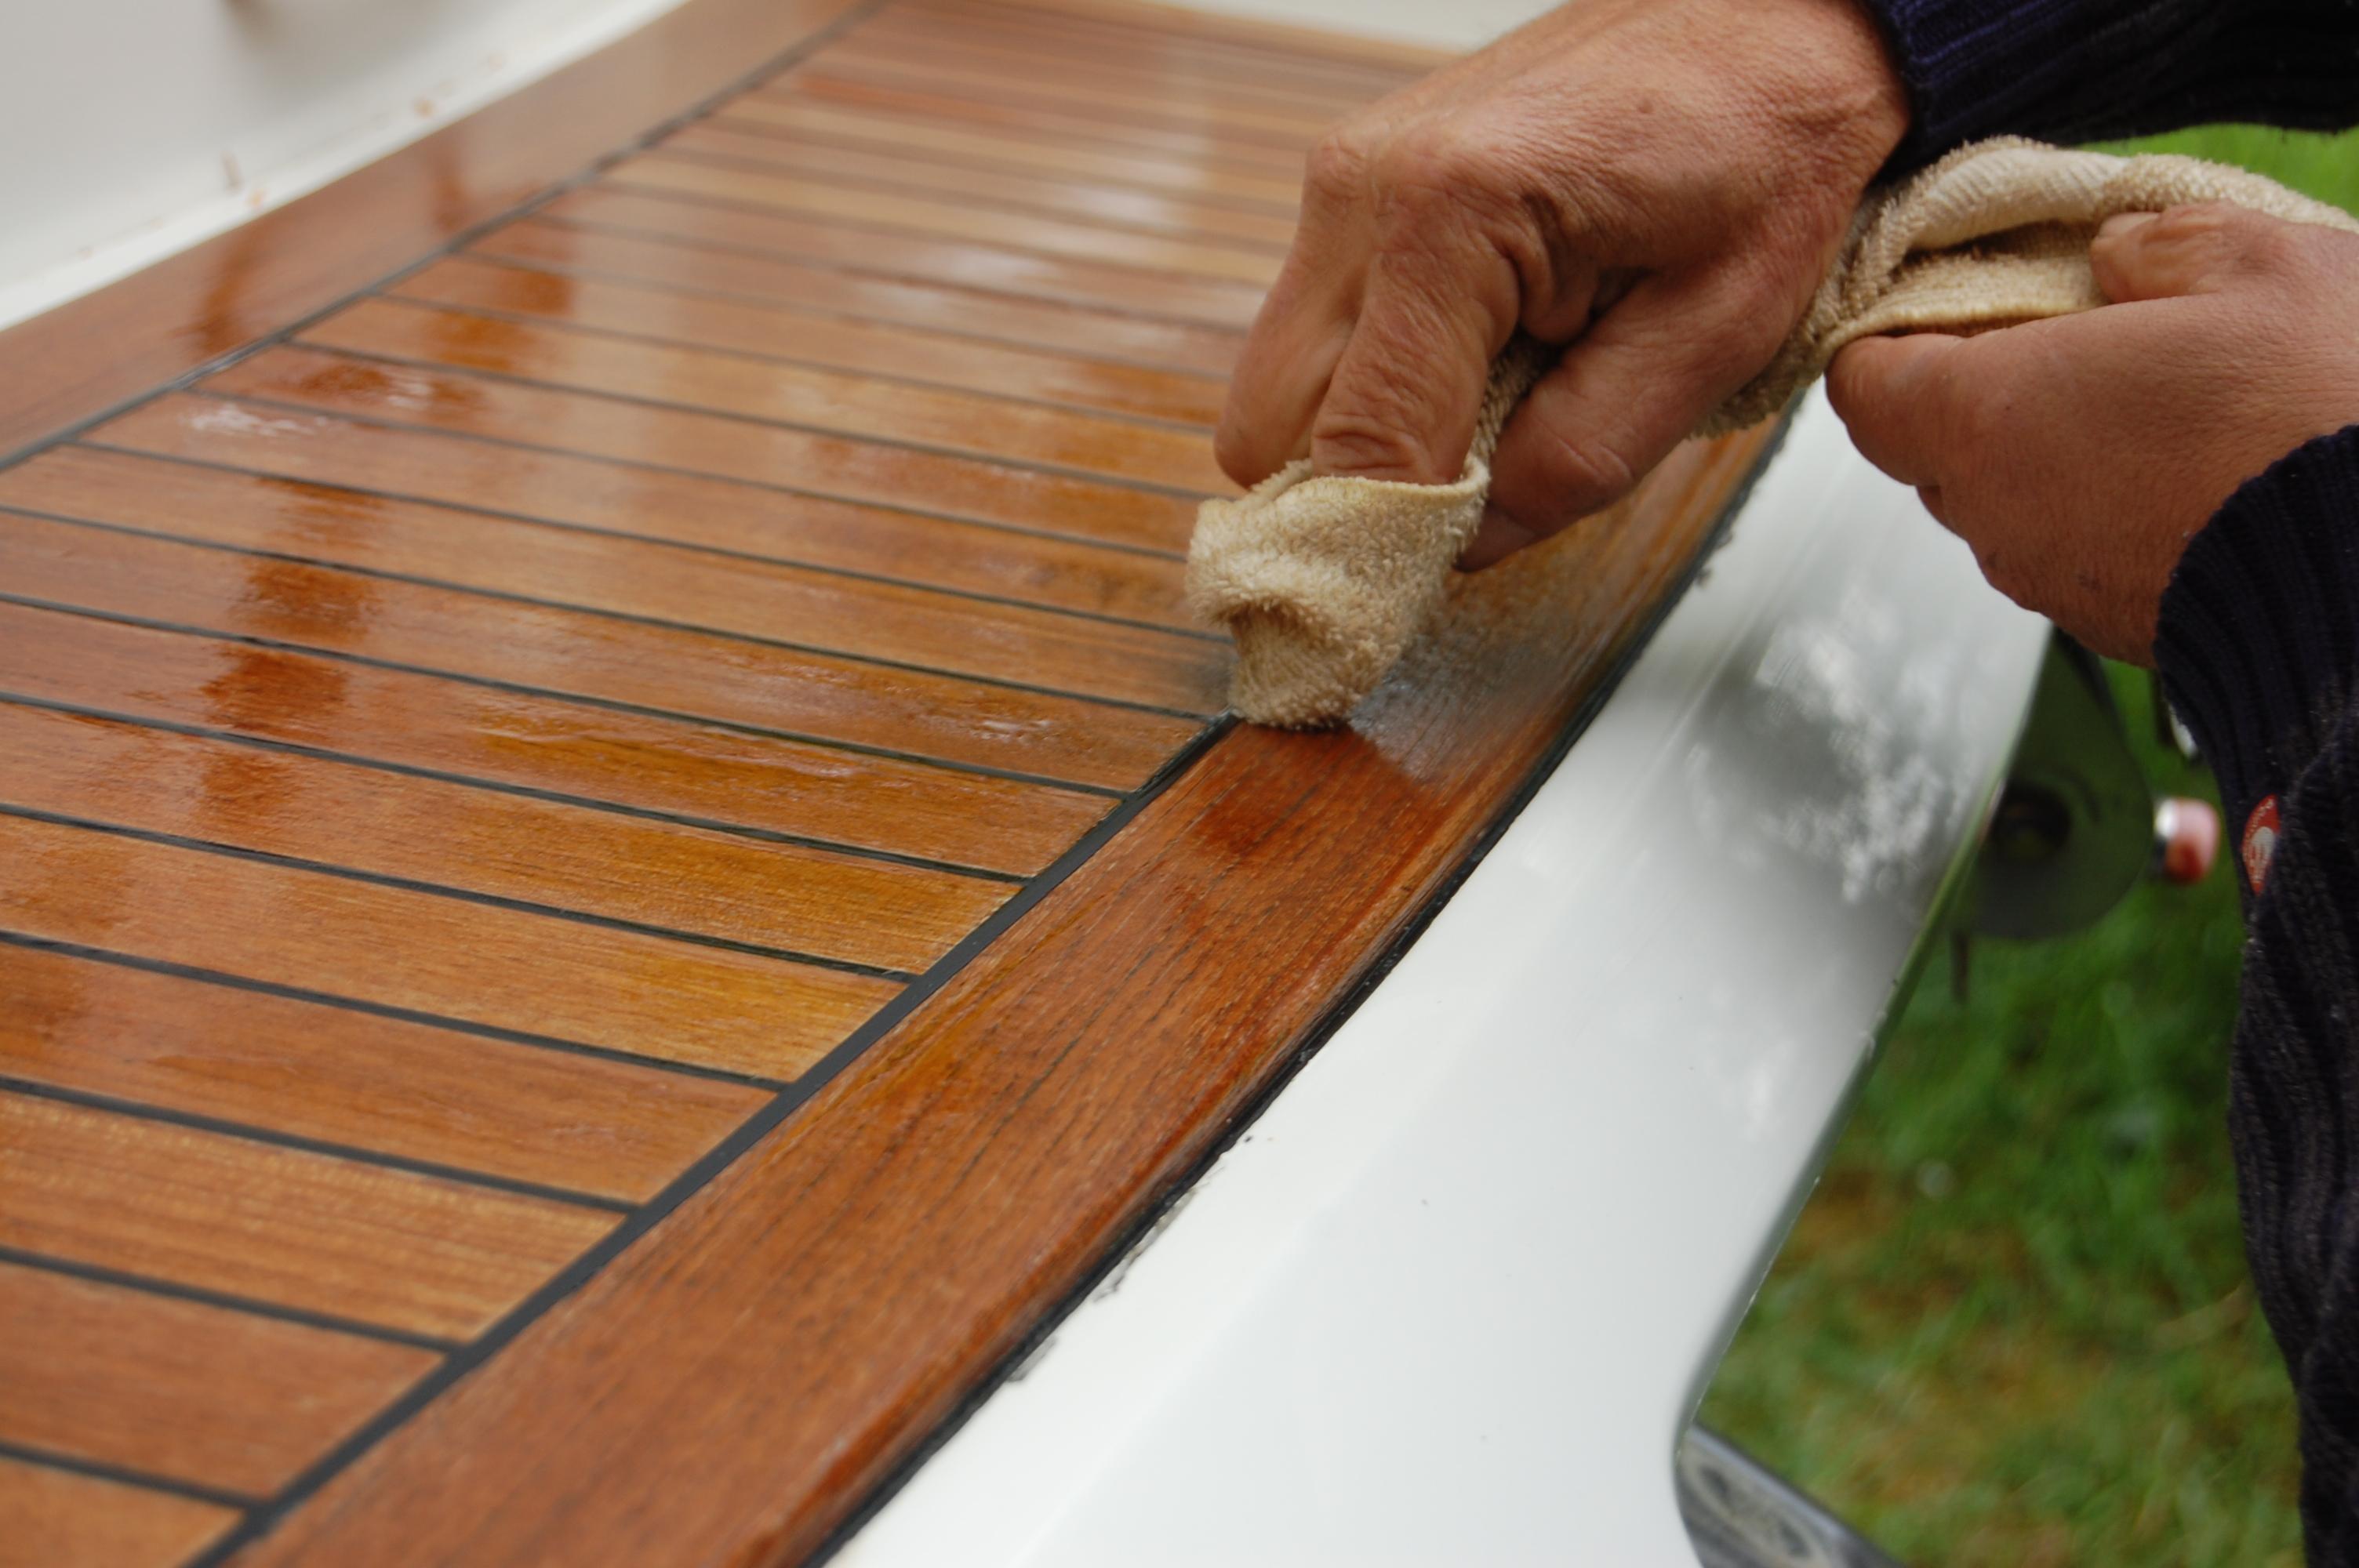 Wood restoration - Step 12